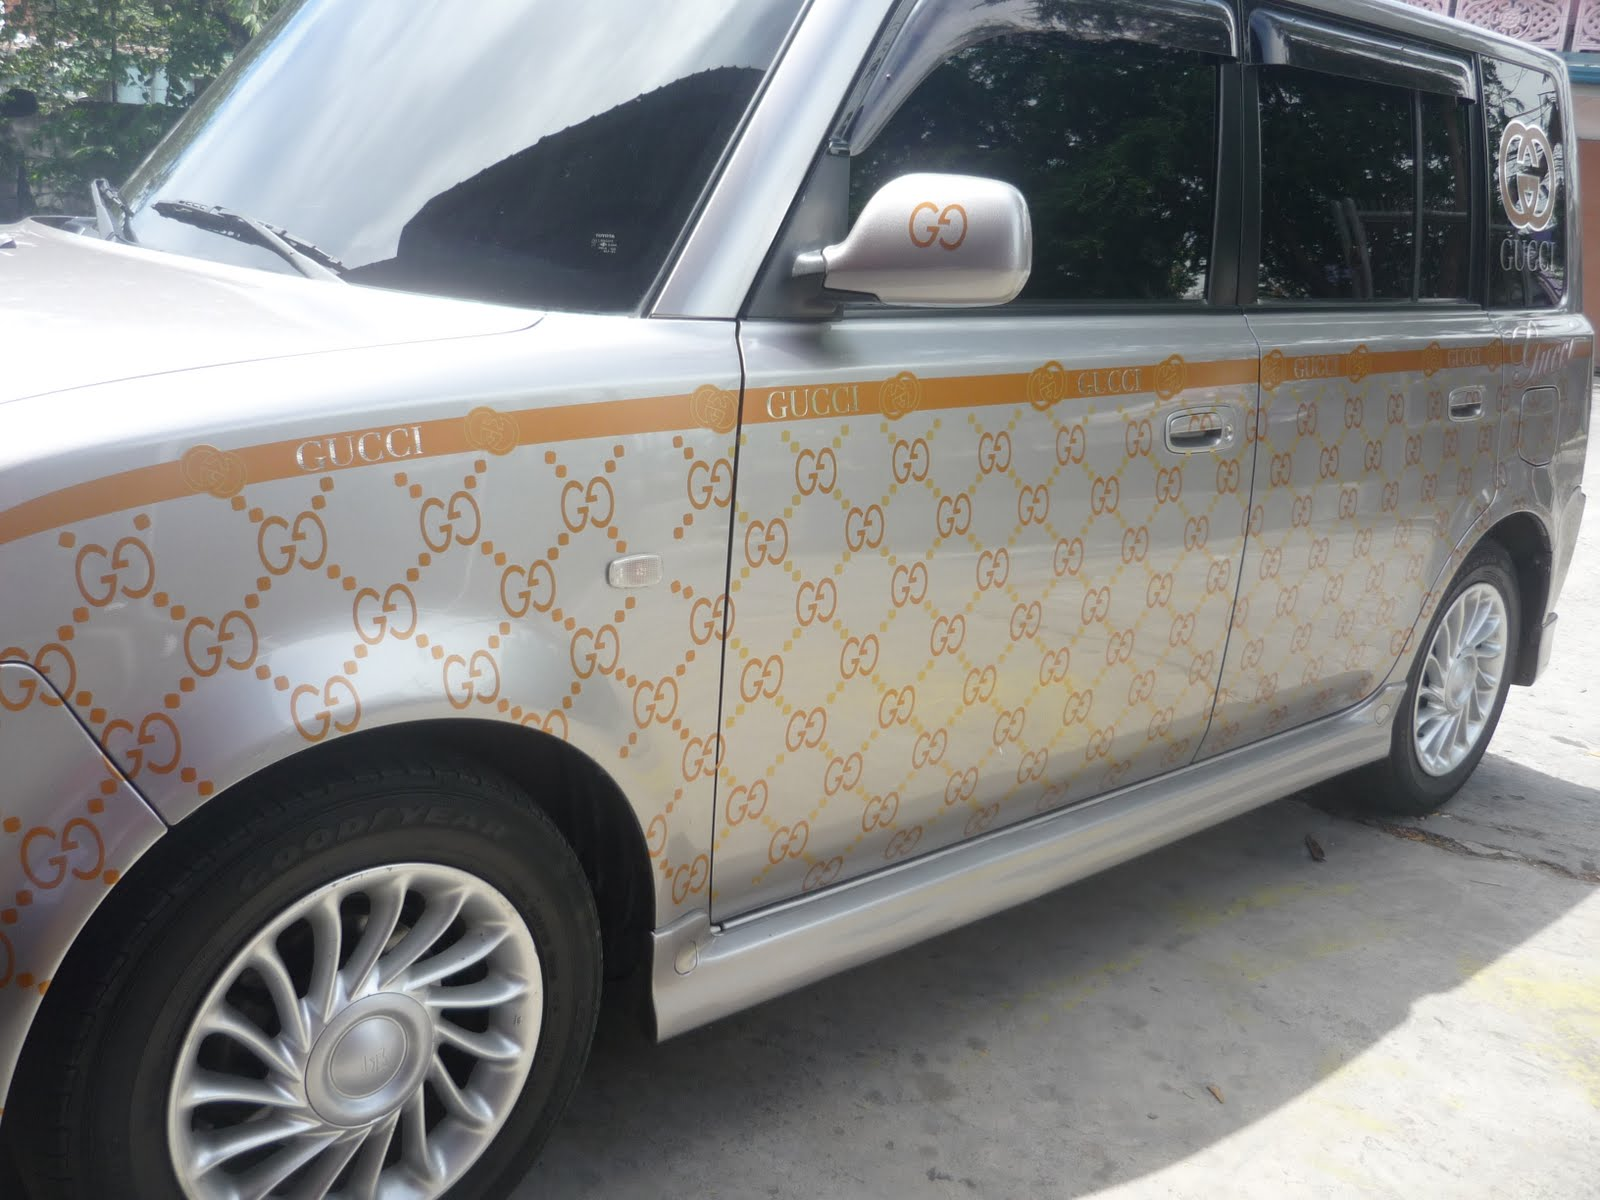 Viva car sticker design - Do You Want Chanel Design Car